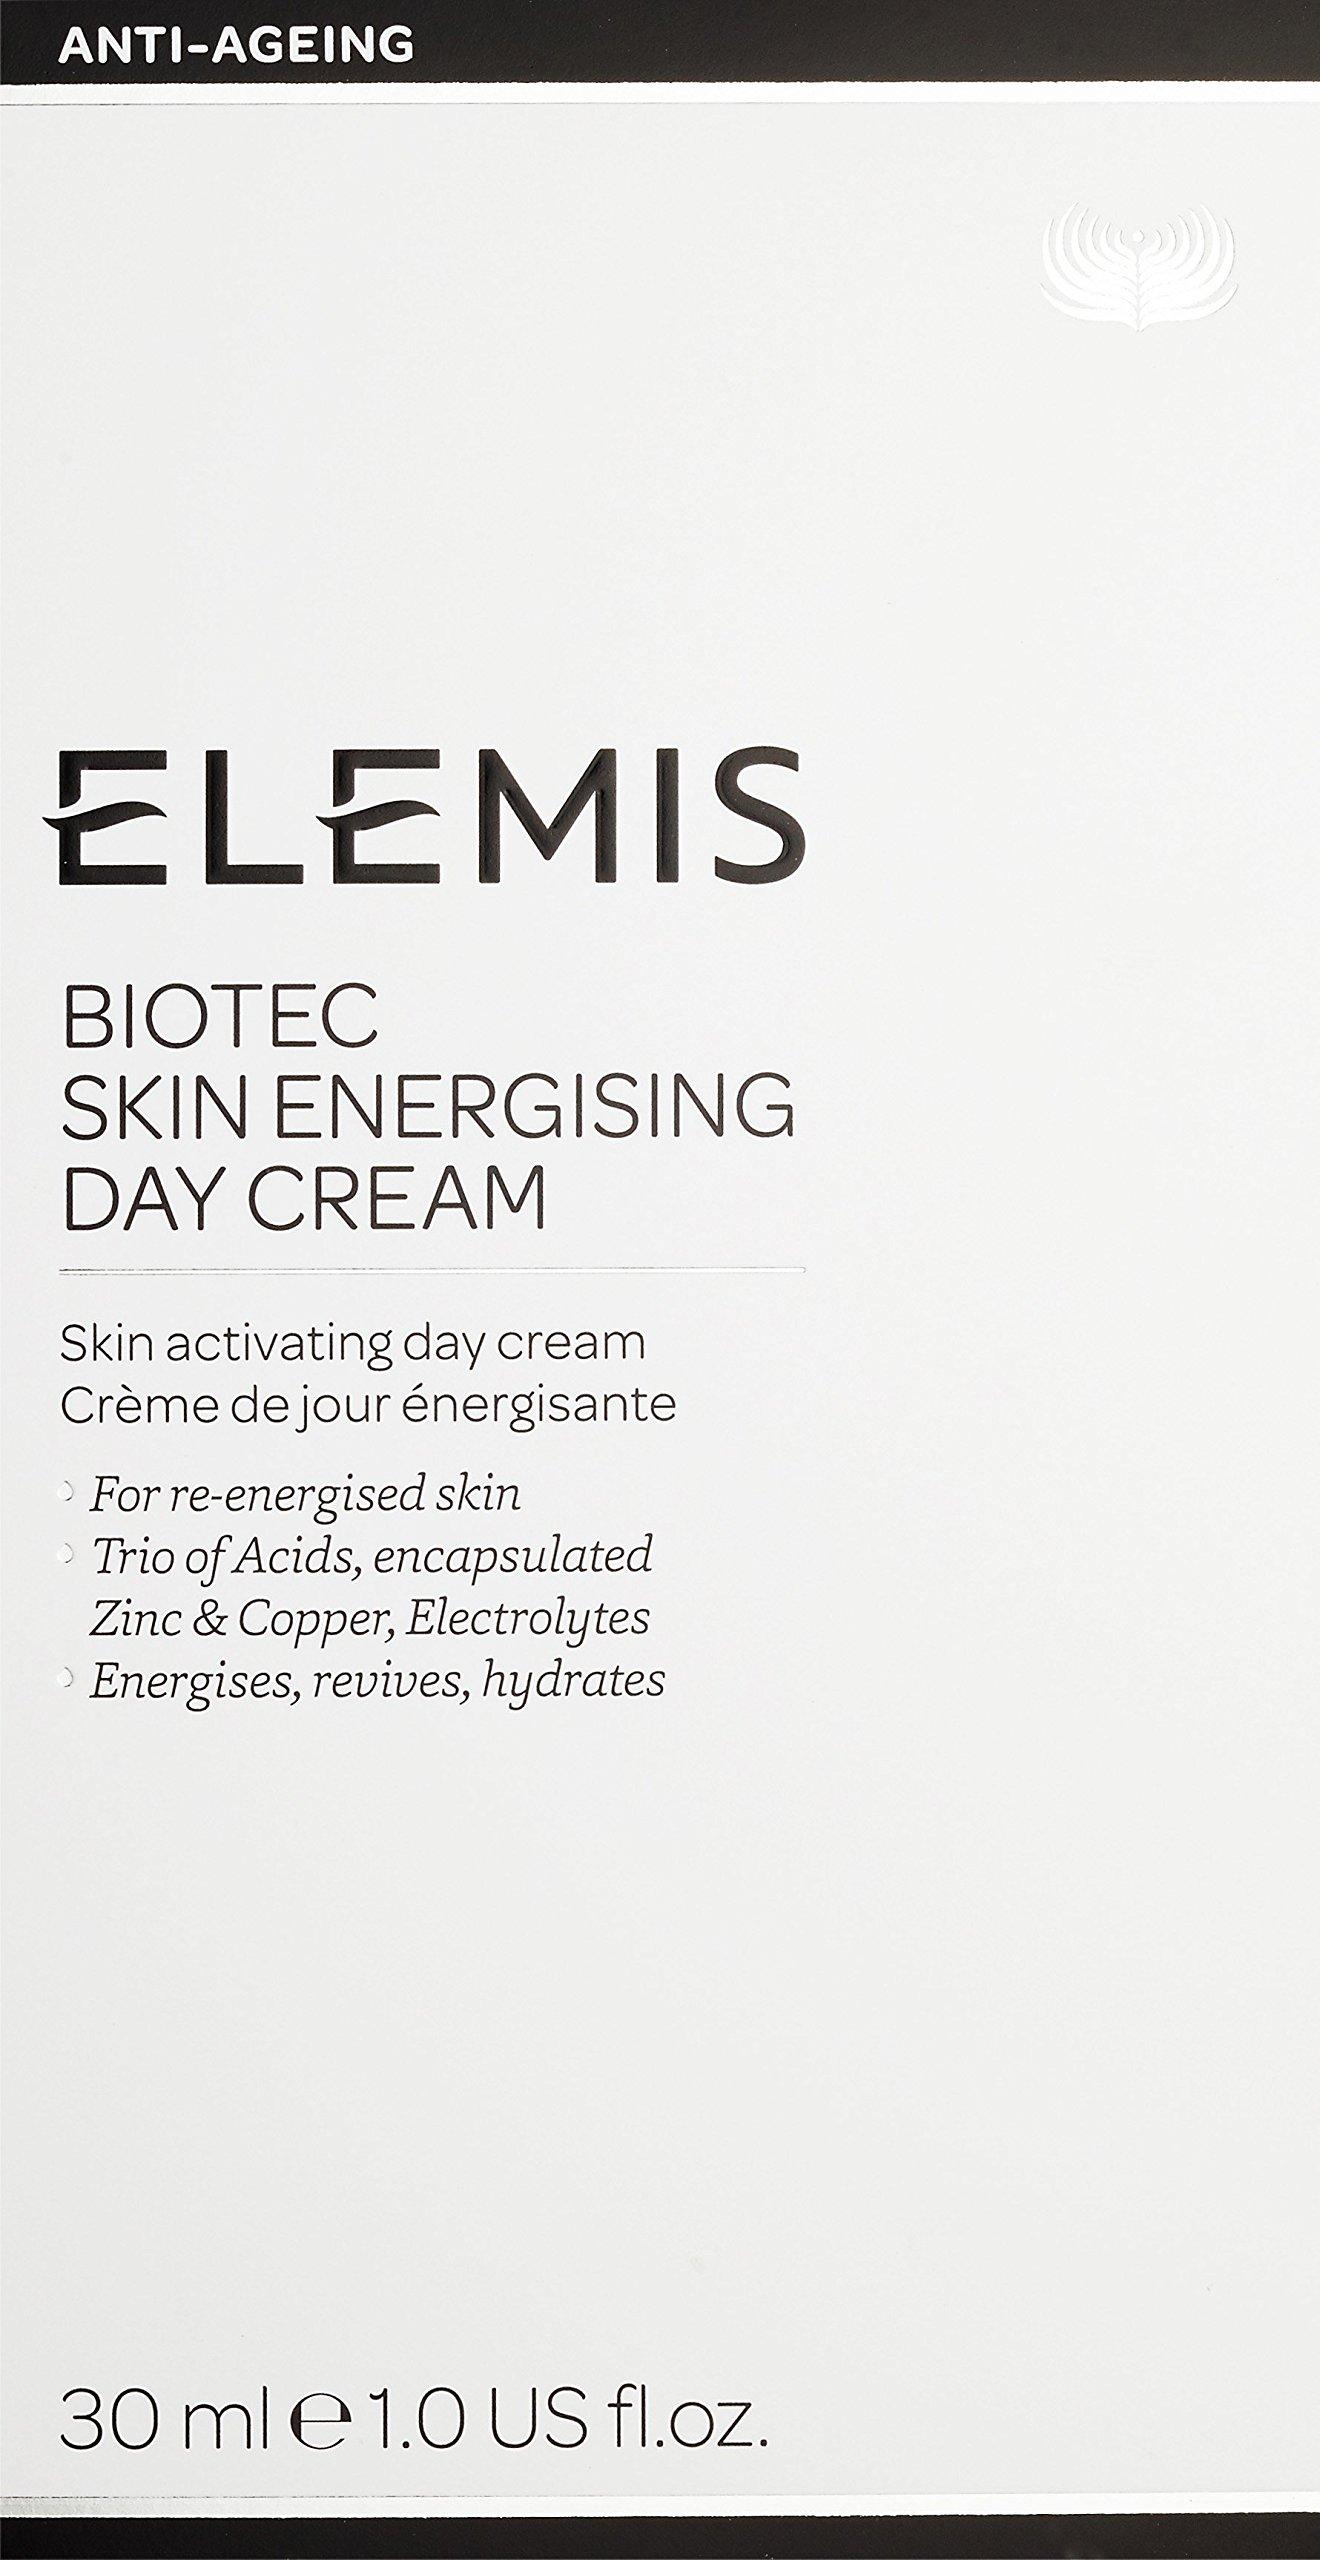 ELEMIS BIOTEC Skin Energizing Day Cream, Skin Activating Moisturizer for Normal Skin, 1 fl. oz. by ELEMIS (Image #4)